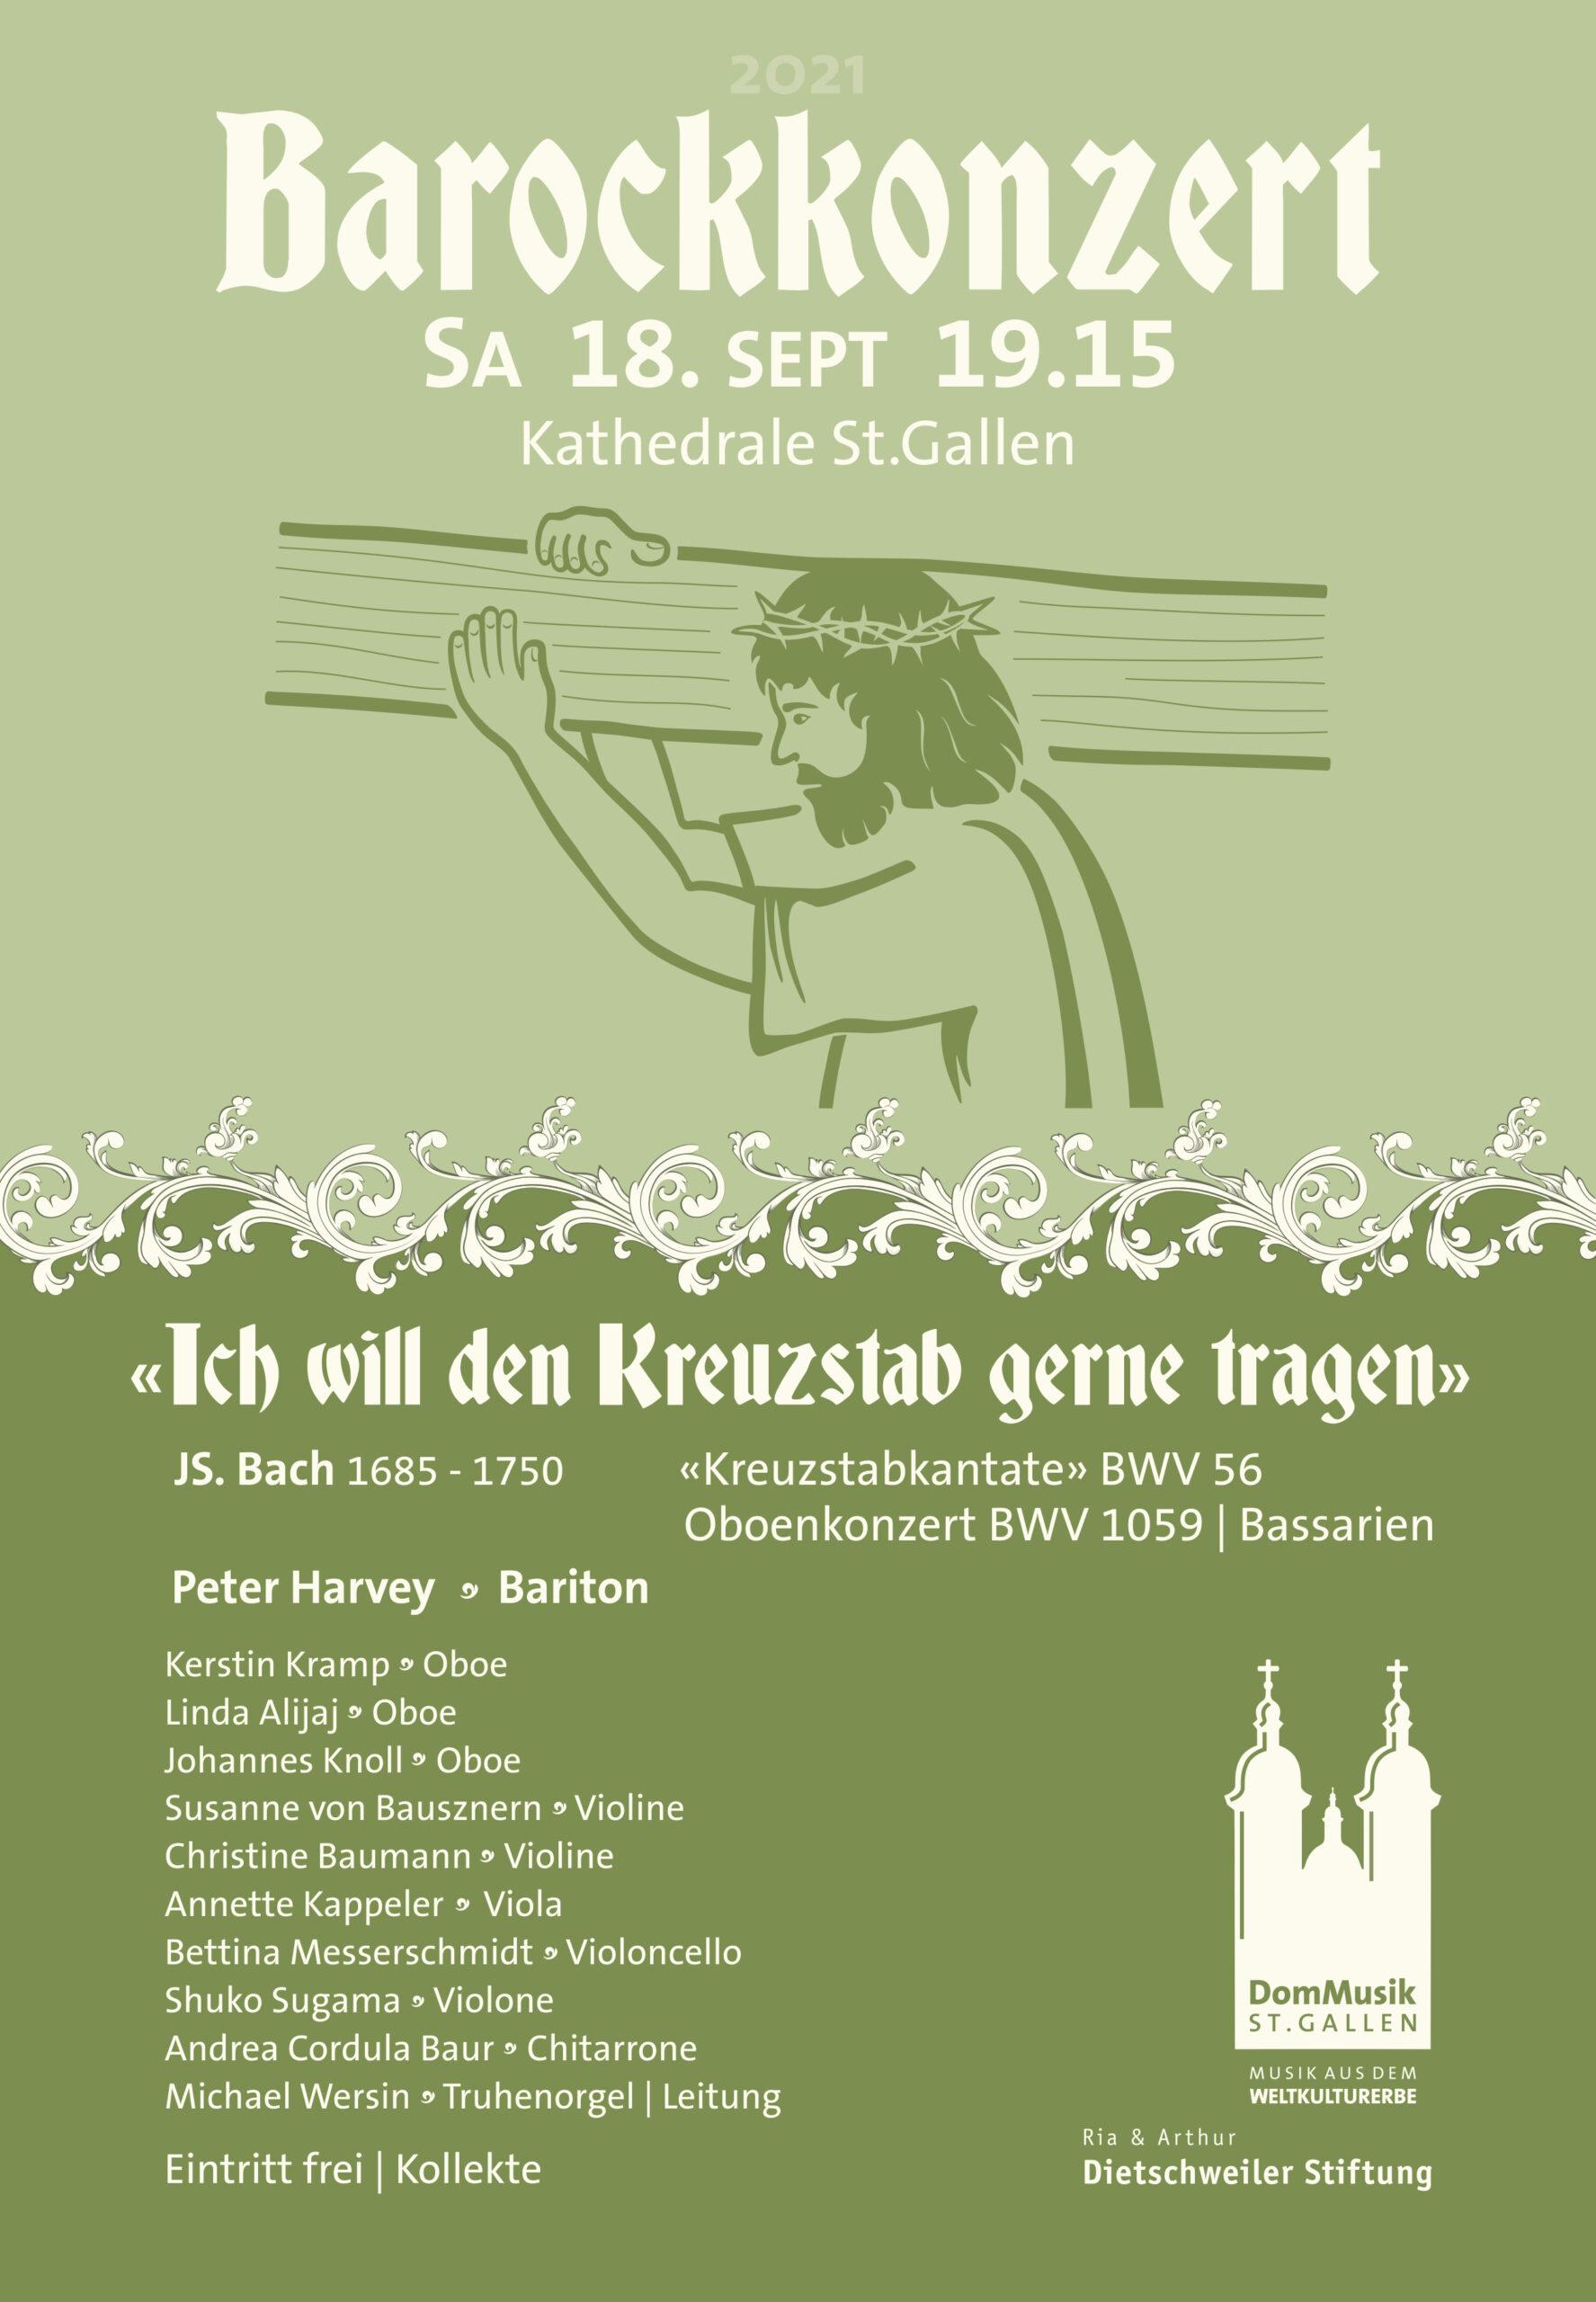 Barockkonzert 21_2 Plakat